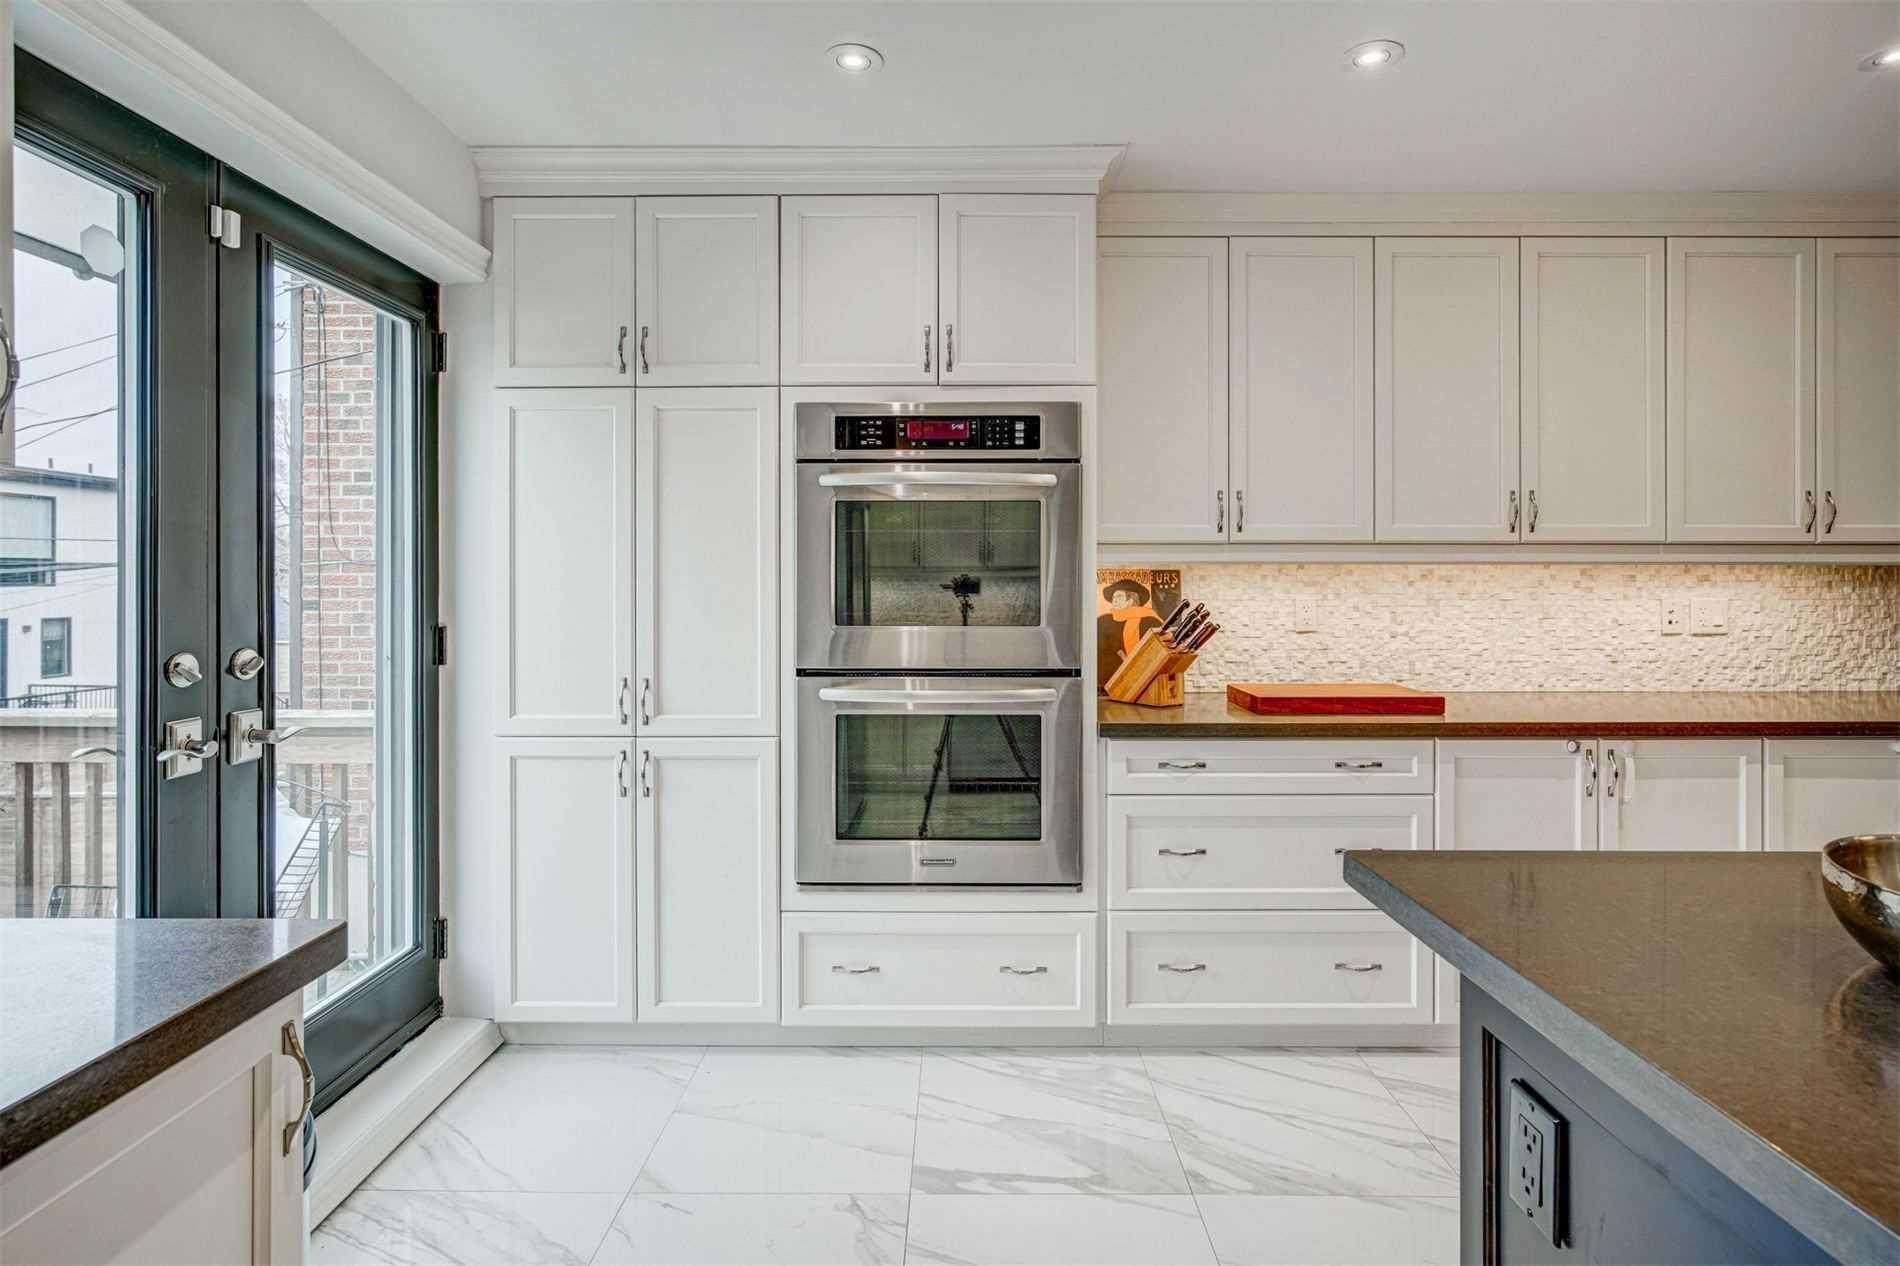 Photo 6: Photos: 92 Holborne Avenue in Toronto: Danforth Village-East York House (2-Storey) for sale (Toronto E03)  : MLS®# E5204452